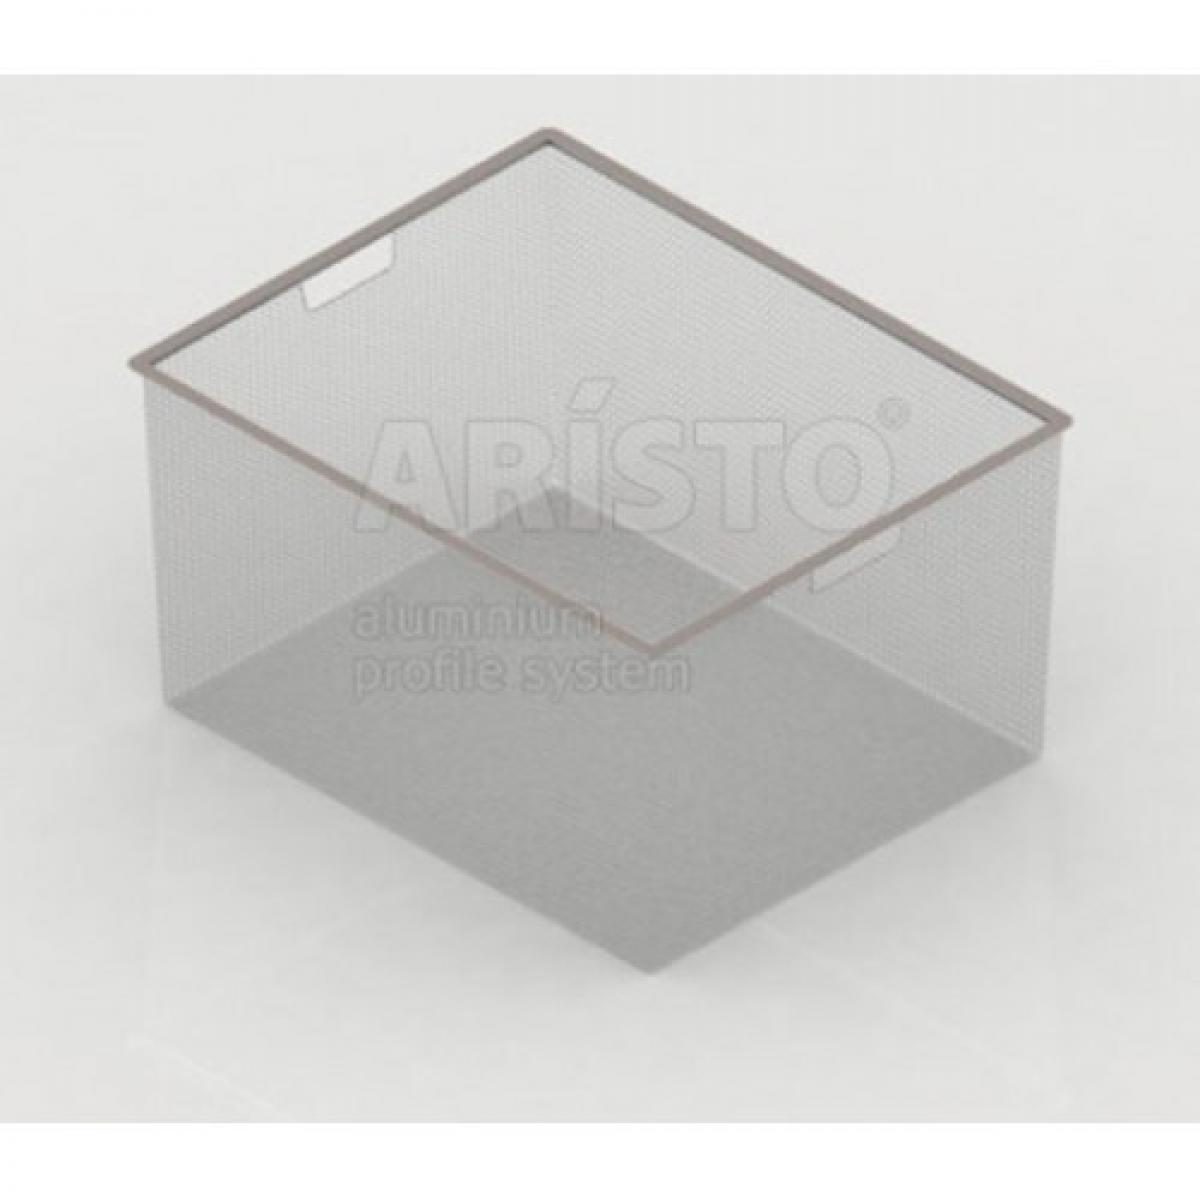 Корзина мелкосетчатая Аристо. Размер ш450мм х г427мм х в285мм. Цвет Металлик